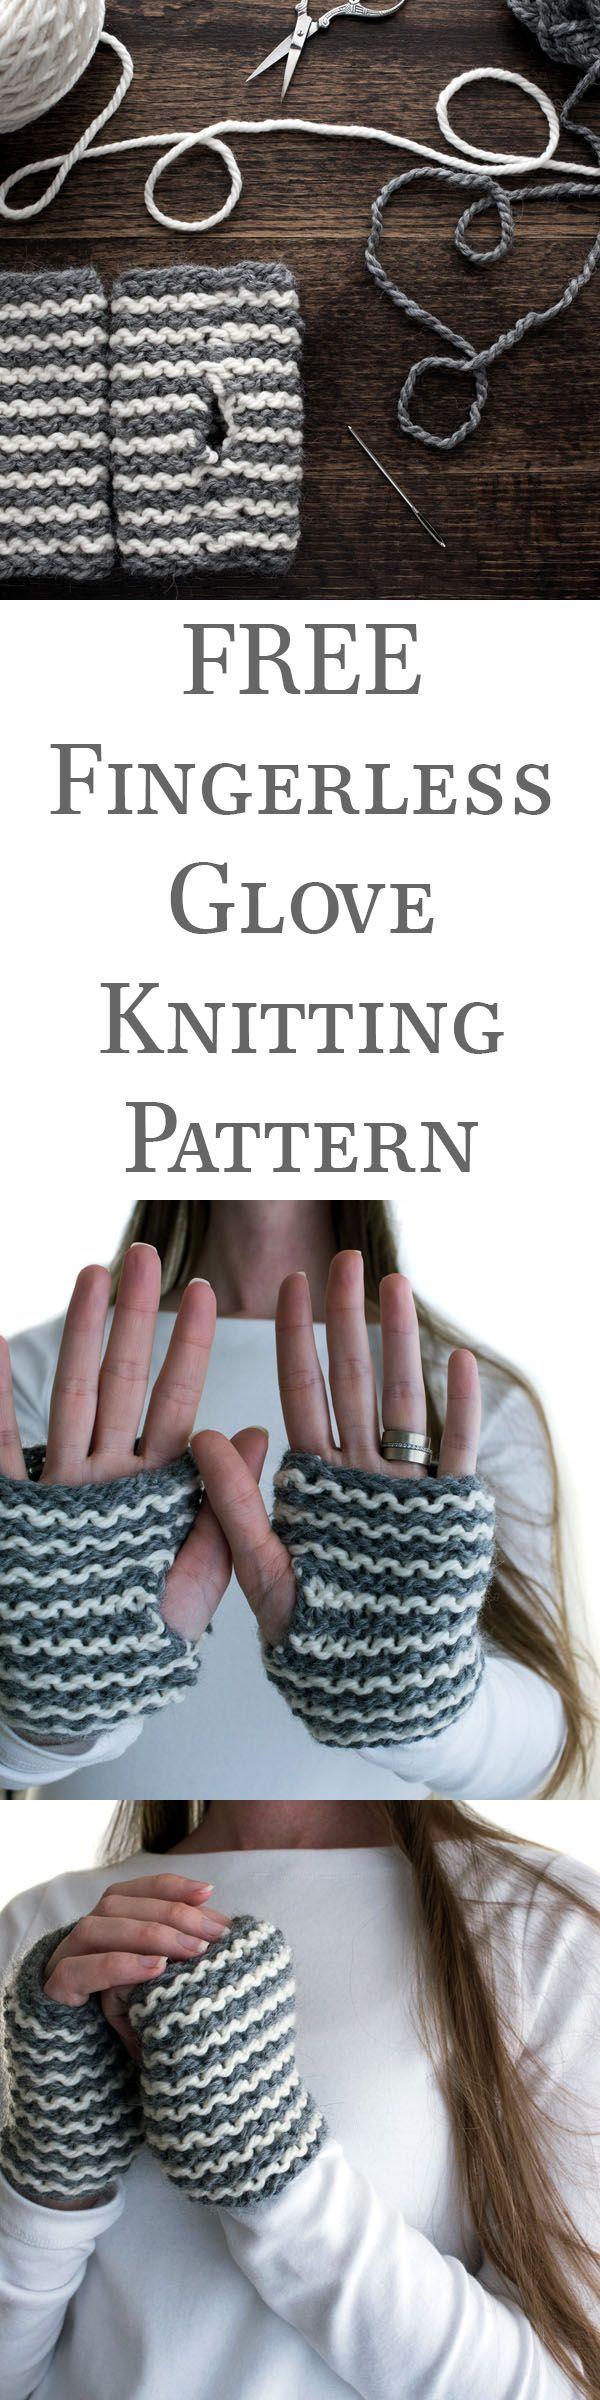 FREE Fingerless Glove Knitting Pattern | knitting | Pinterest | Tejidos